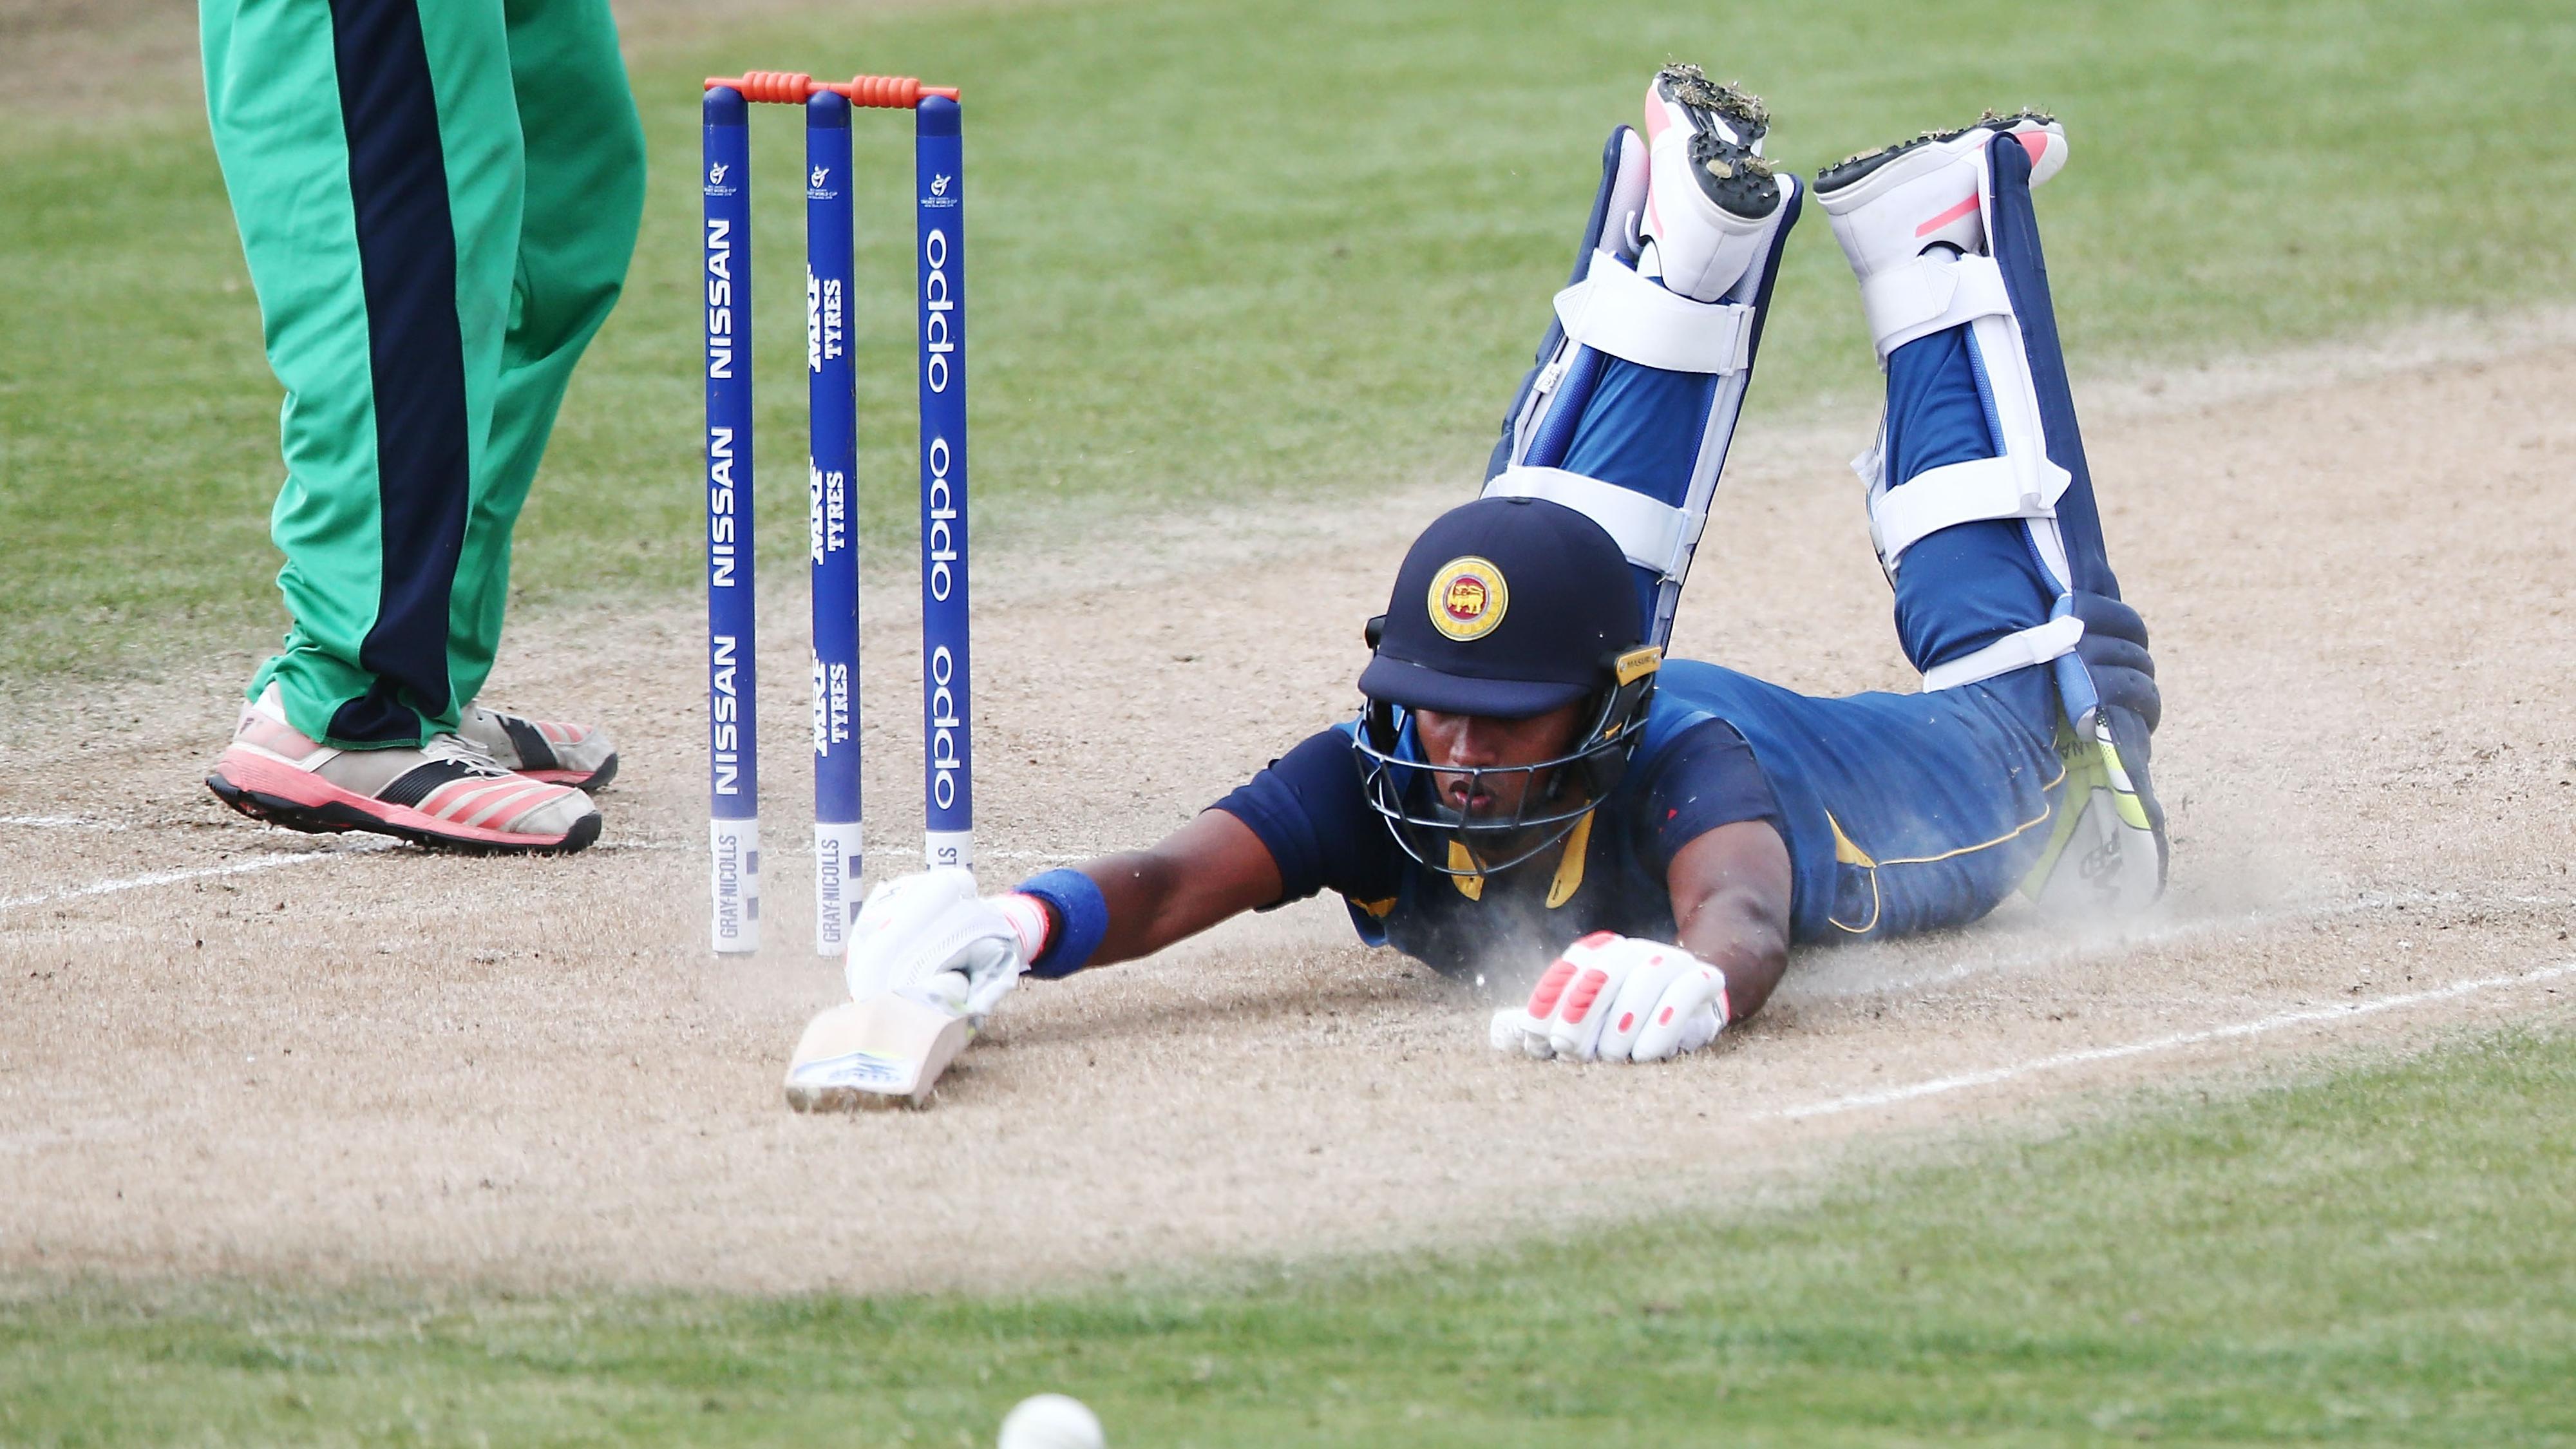 Sri Lanka v Ireland, U19 Cricket World Cup, 2018